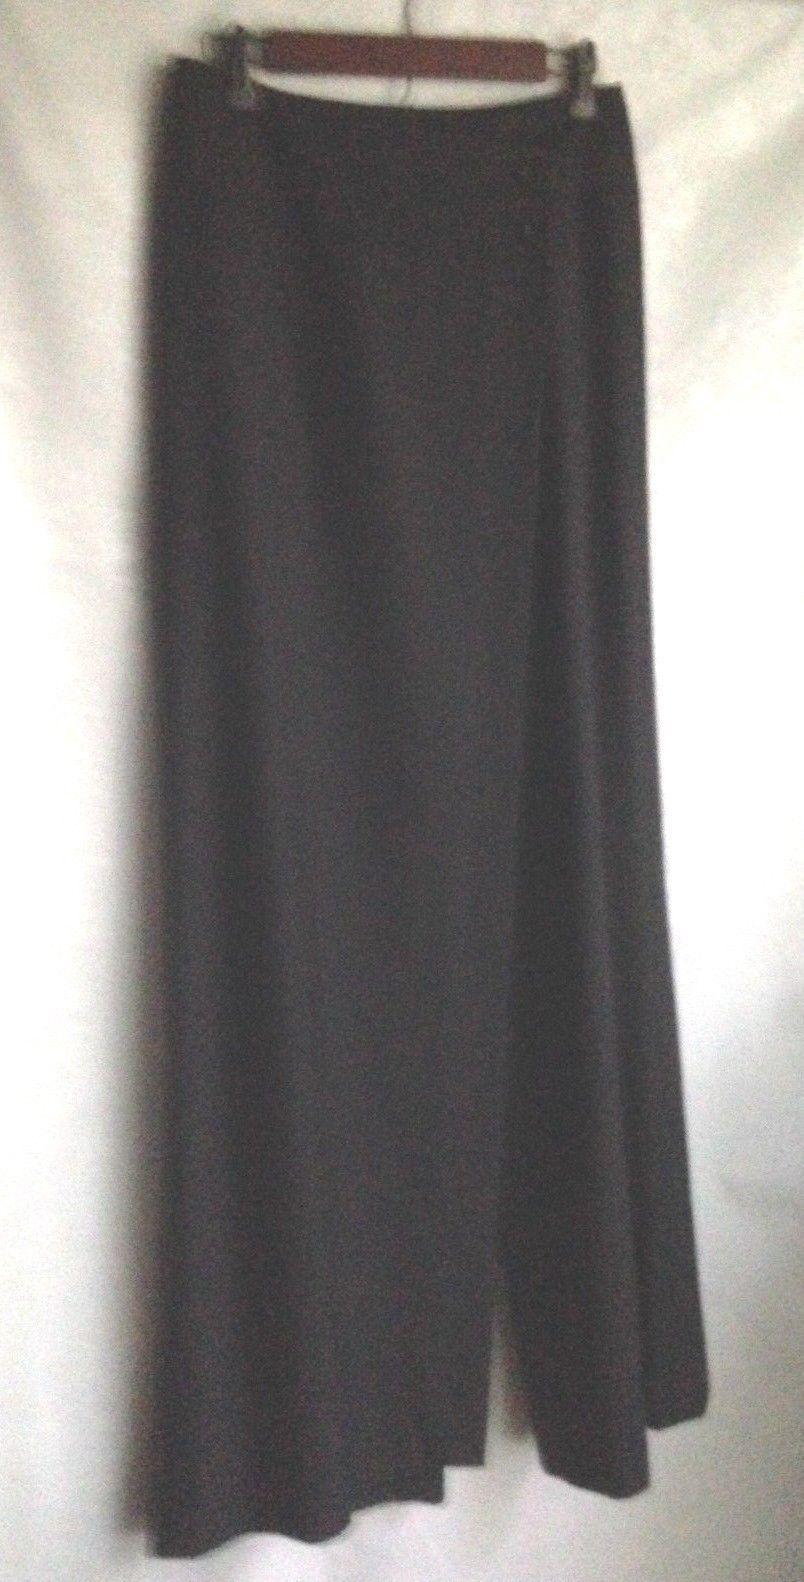 Vintage Saks Fifth Avenue Dress Slacks Women's Size 4 Skirt Panel Pants Black